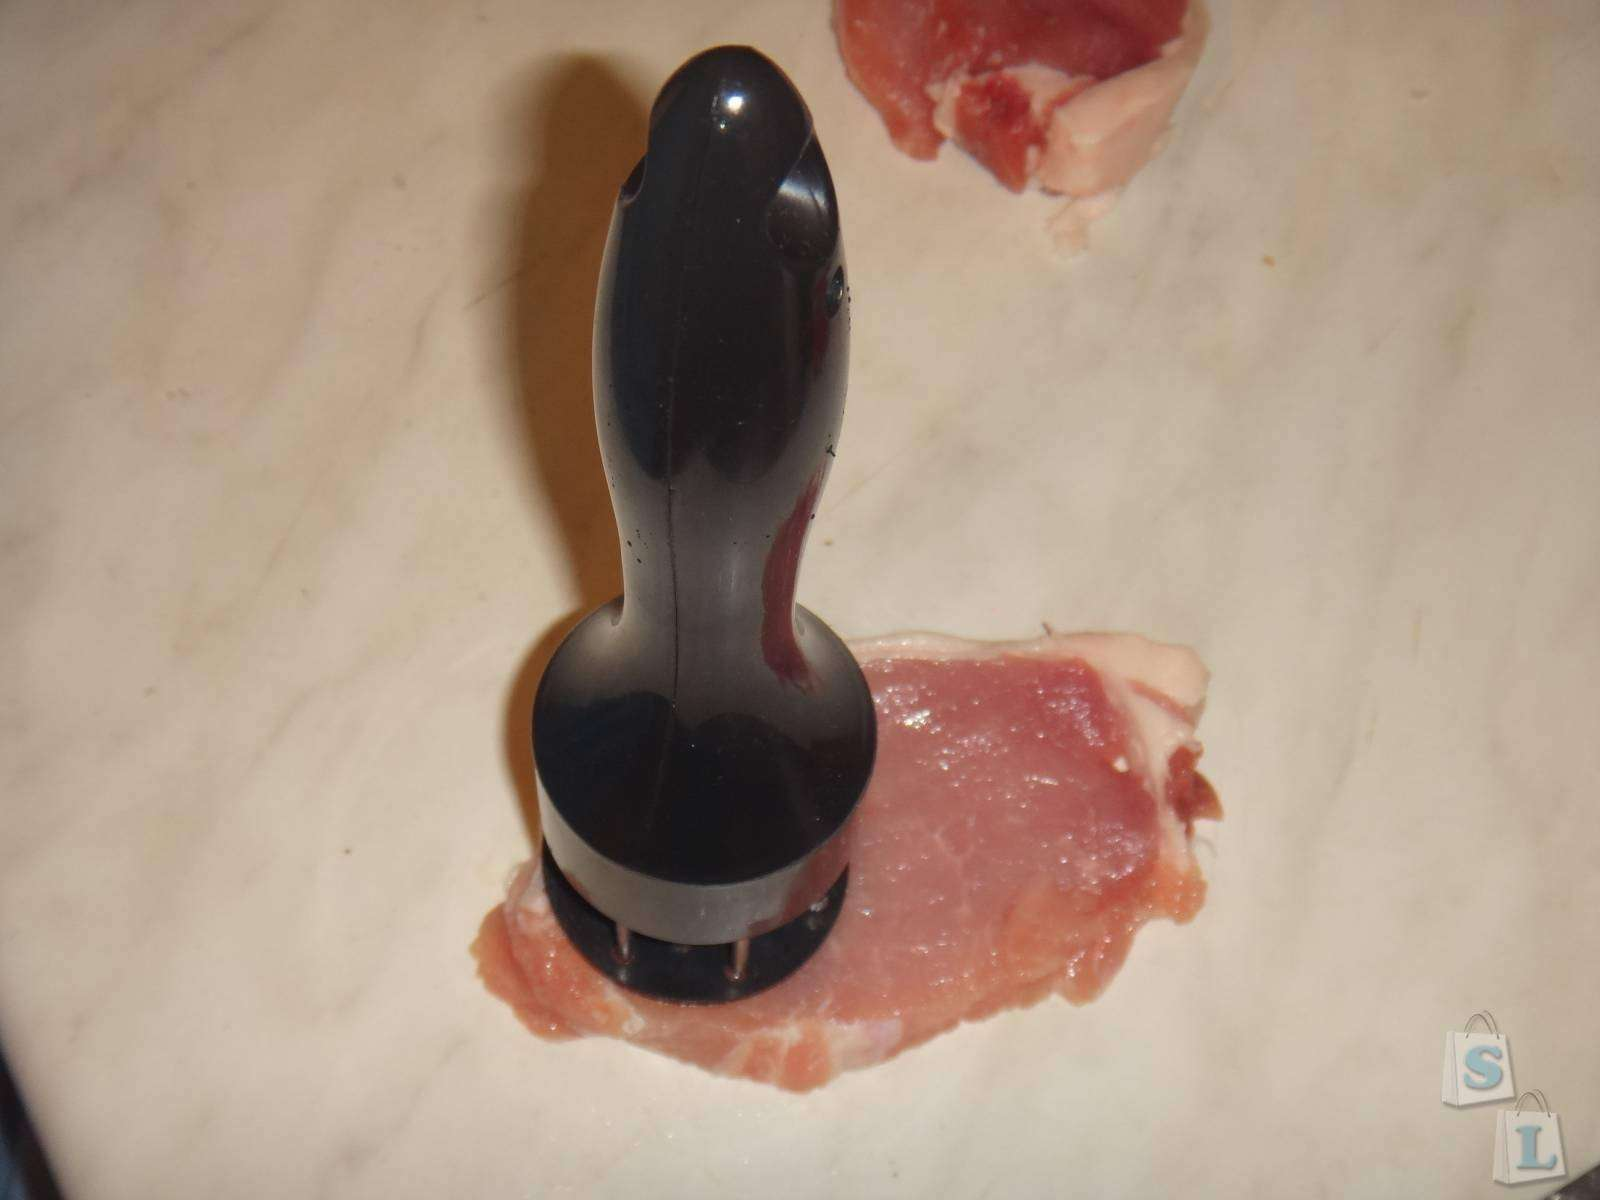 GearBest: Тендерайзер для мяса